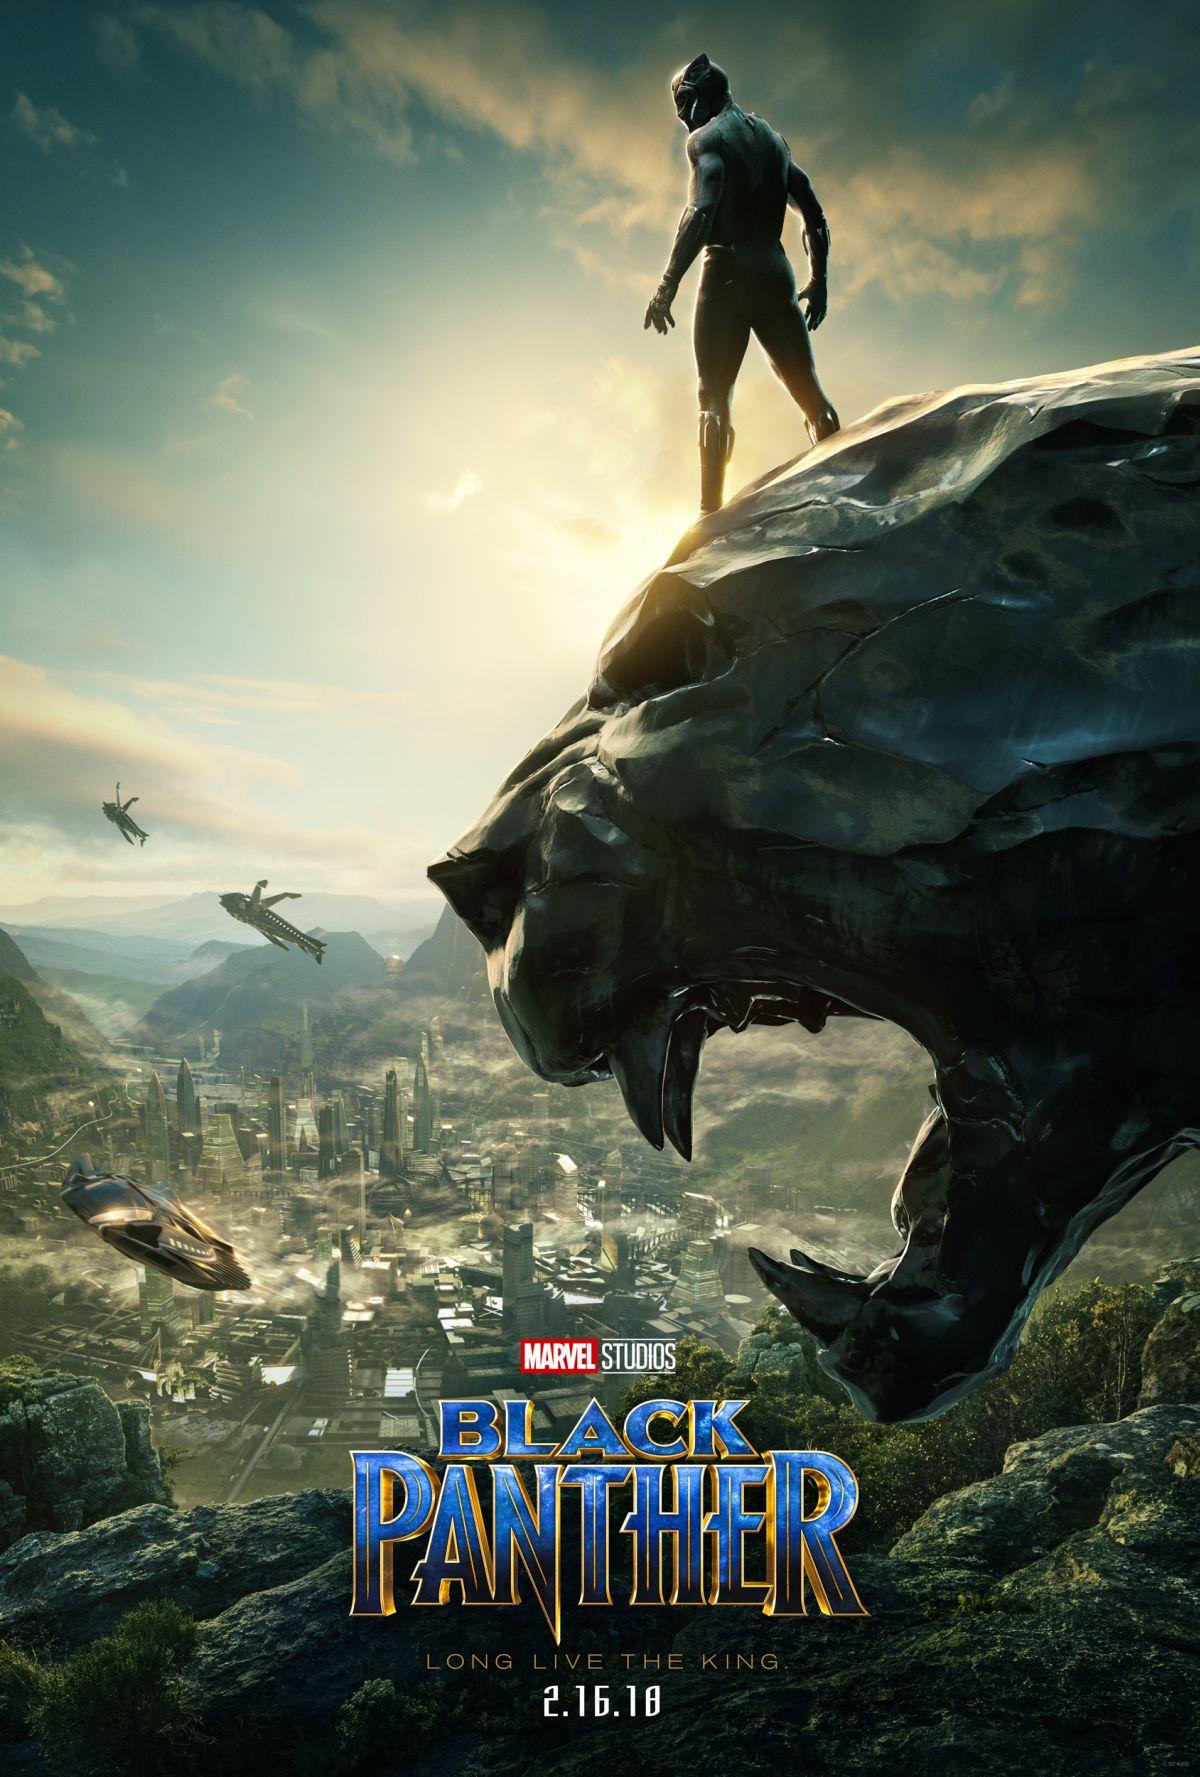 Black Panther Trailer & Poster 2